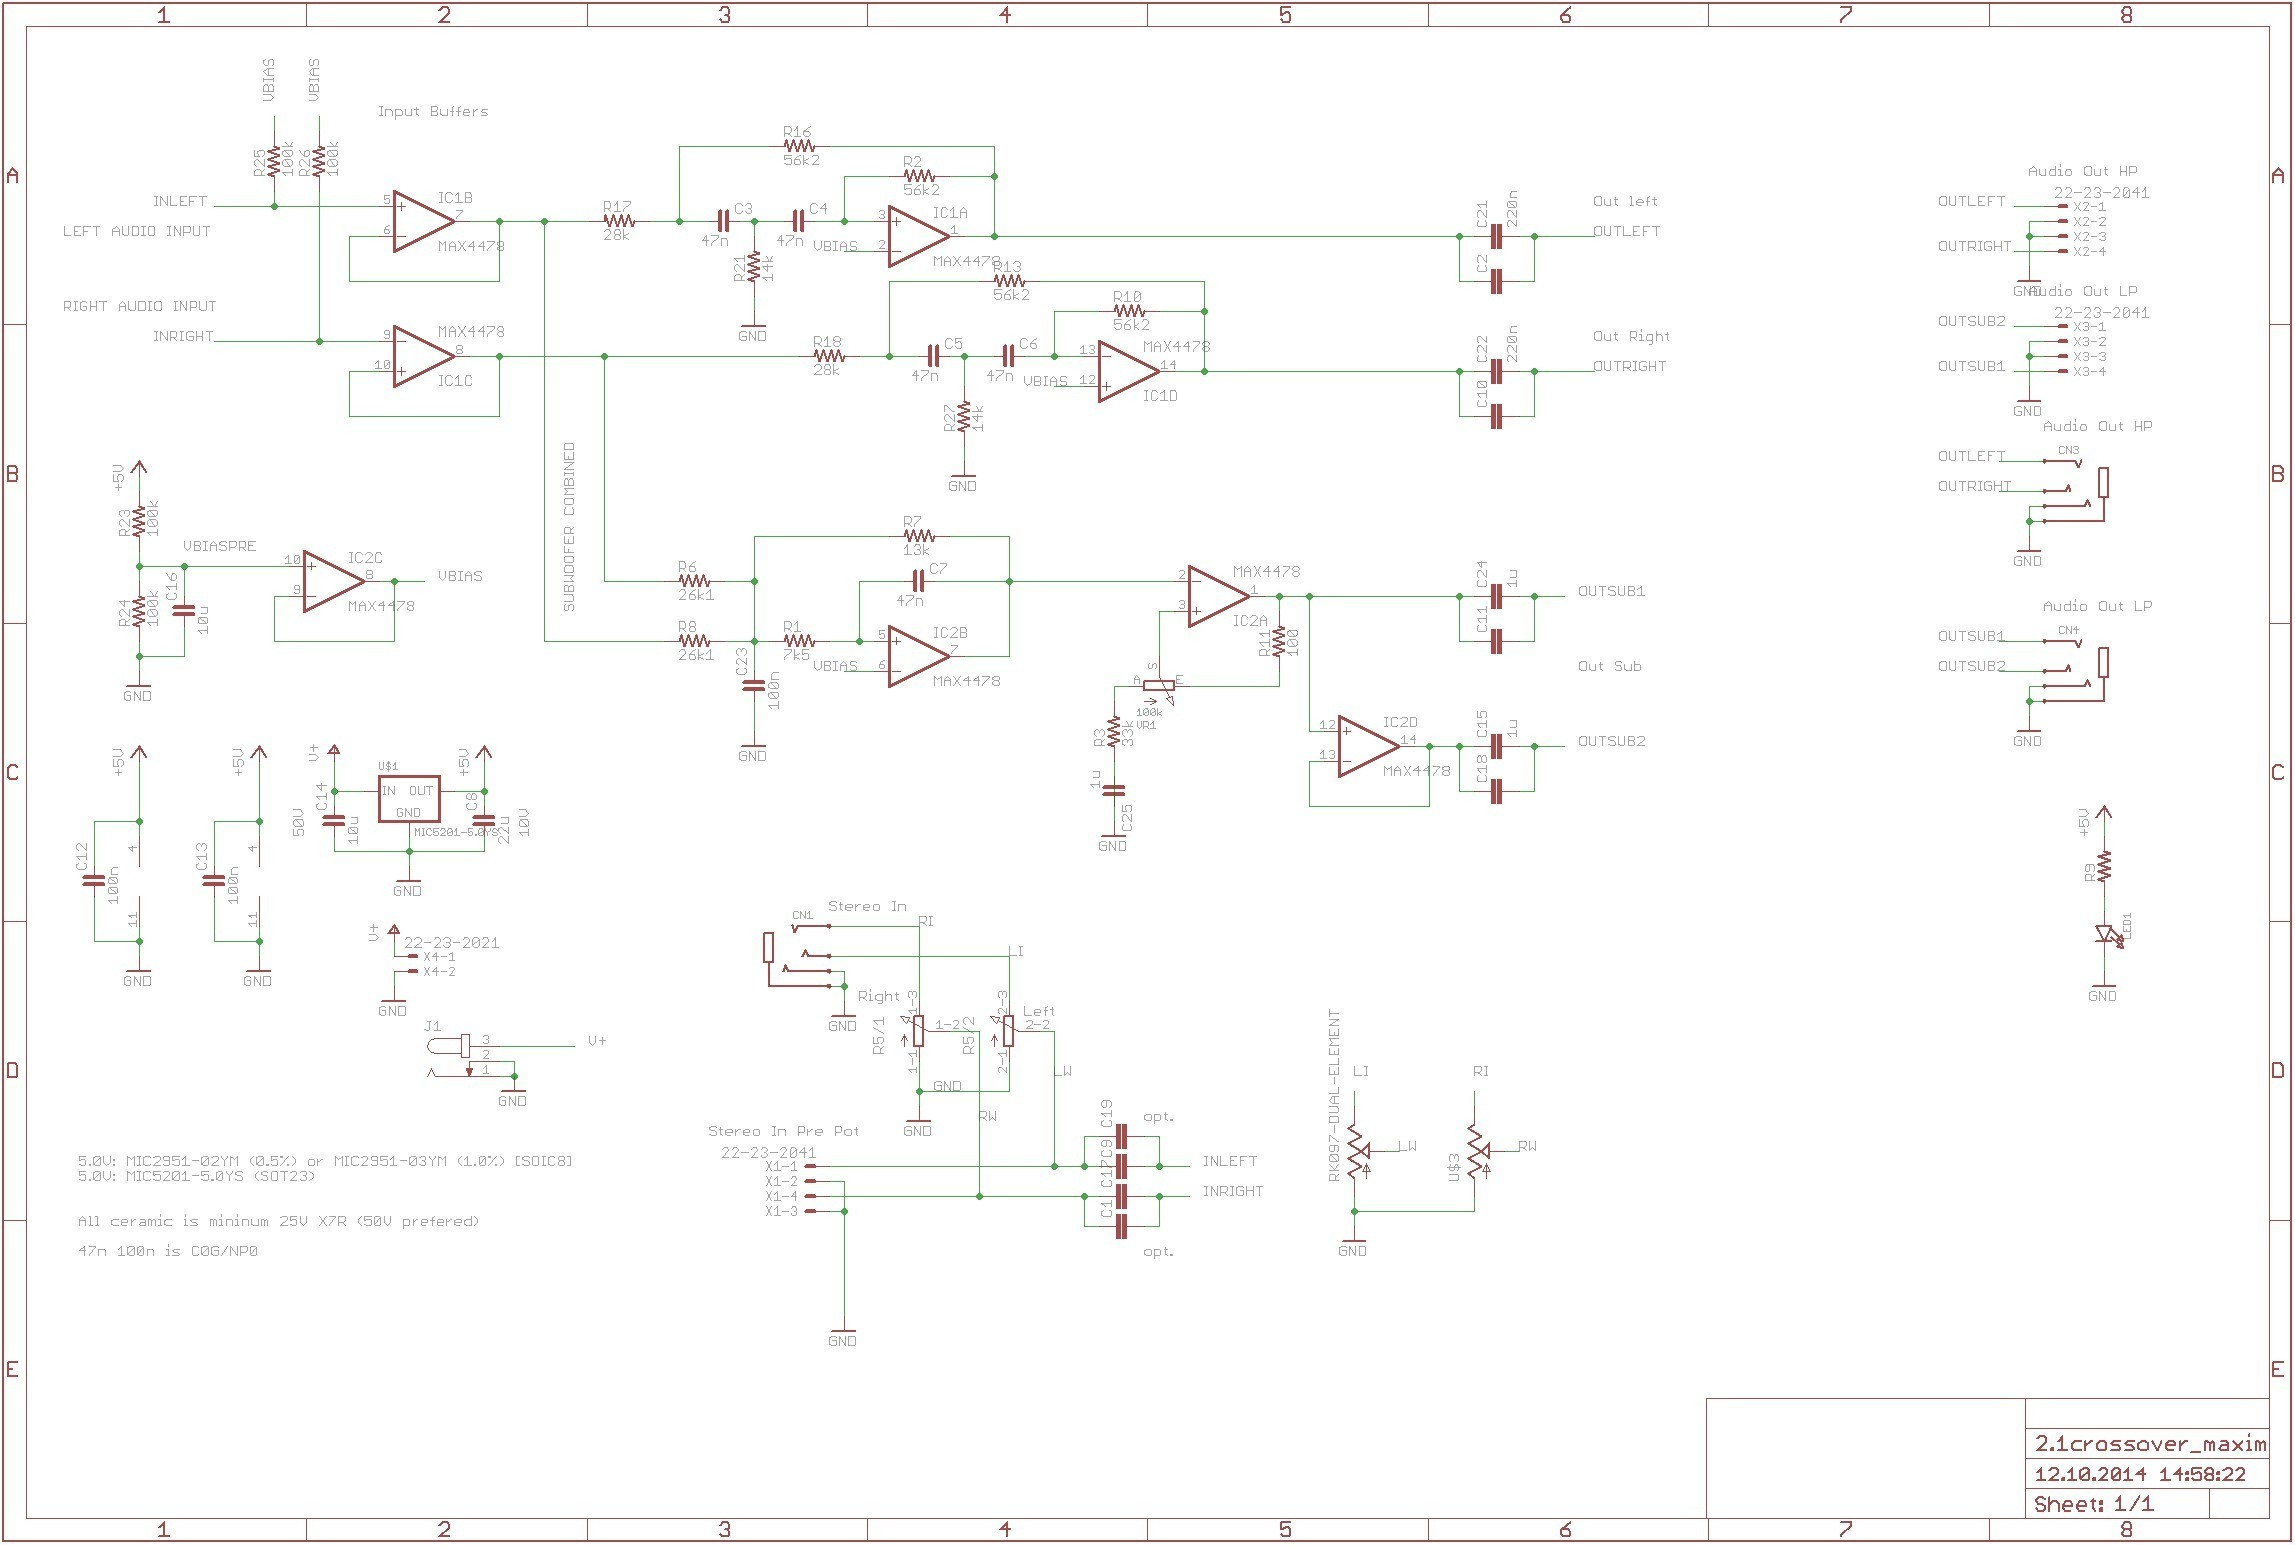 Turbo Engine Diagram 20fresh Bmw Engine Diagram Of Turbo Engine Diagram